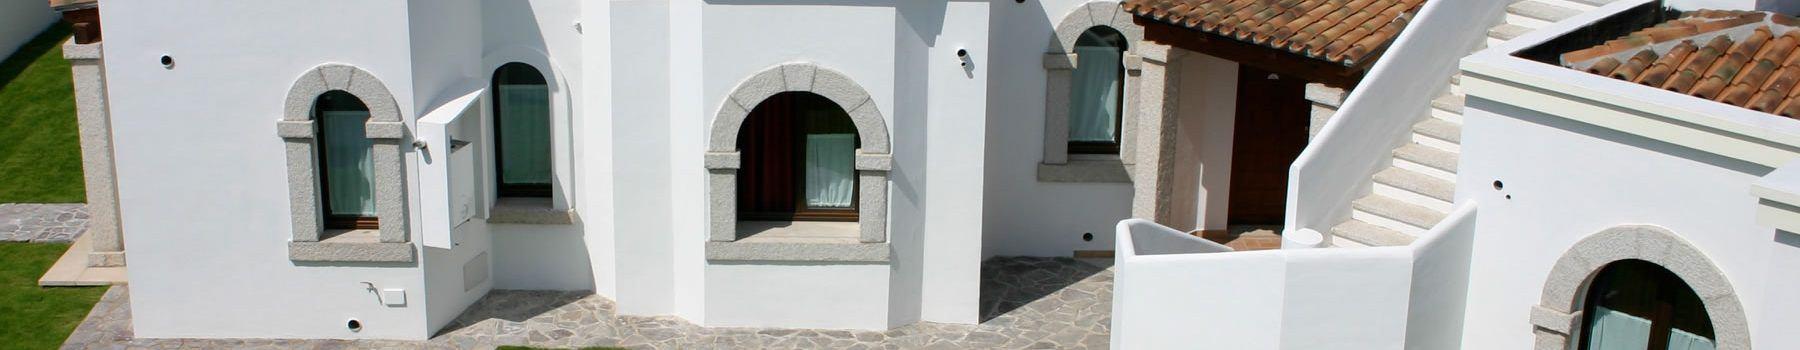 resort-vista-blu-esterni-ville-4